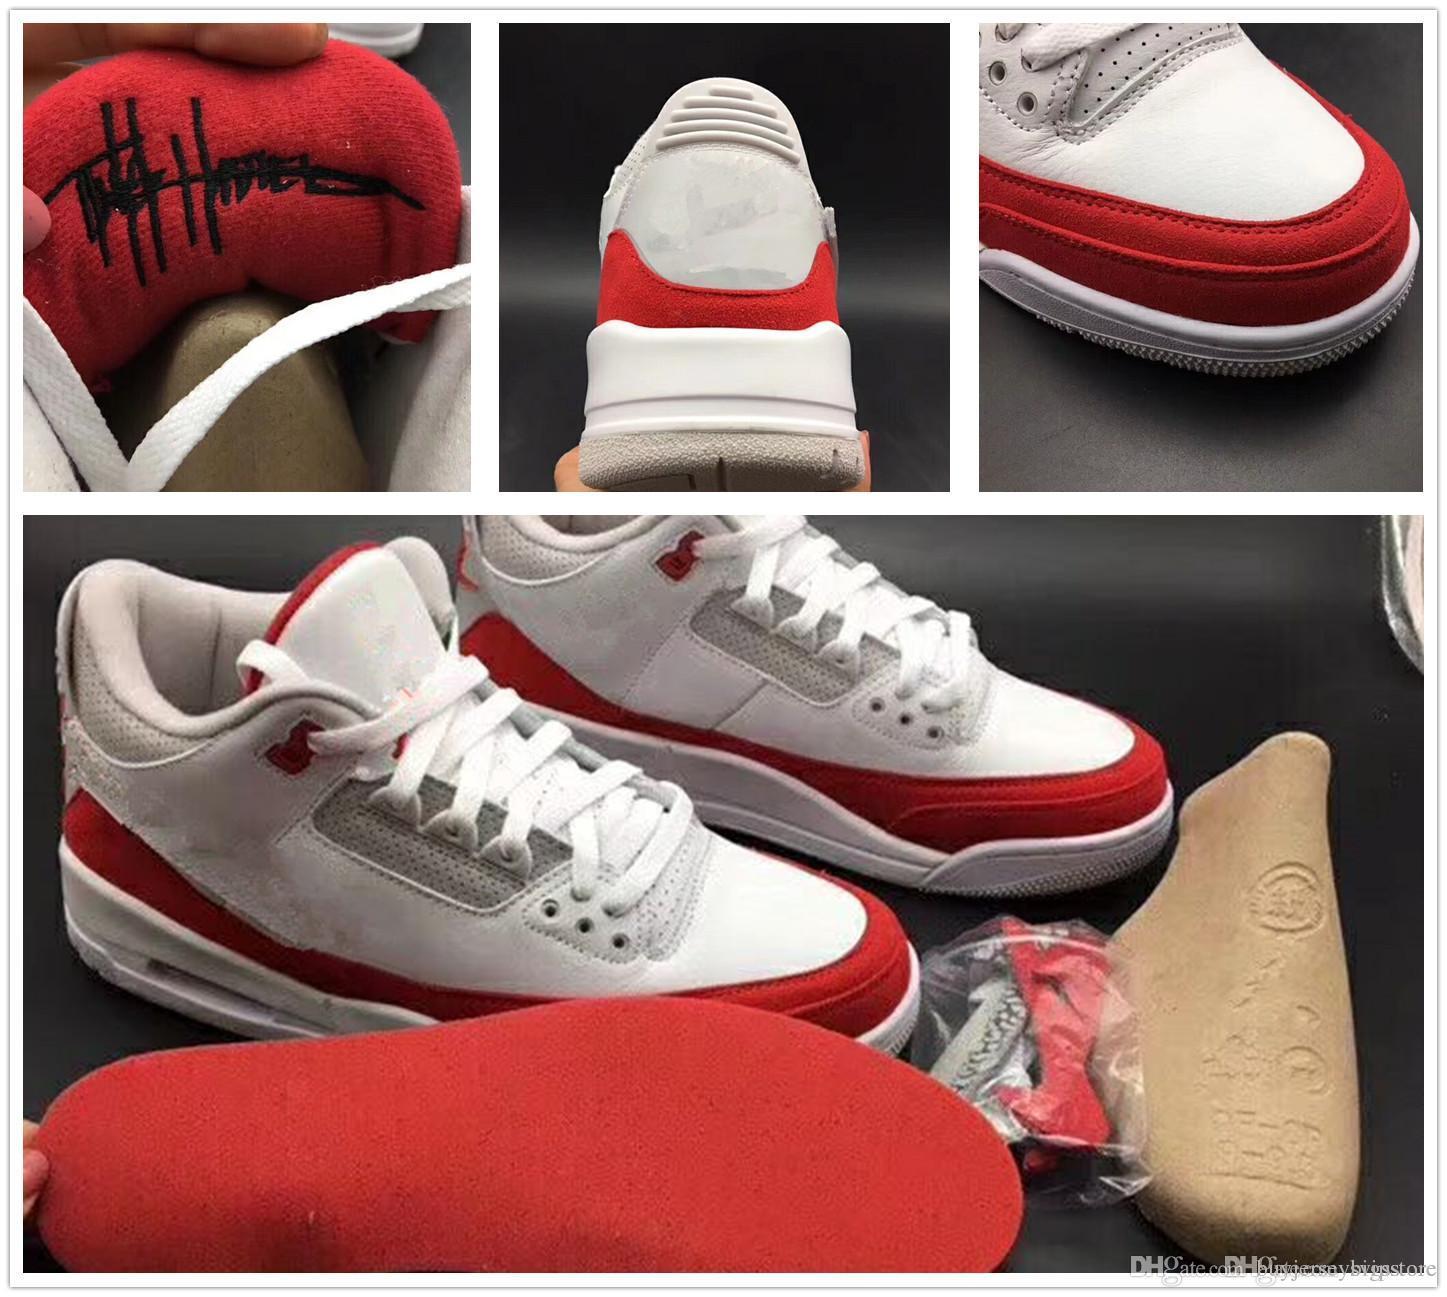 435b56733573a4 2019 Best Quality 3 Tinker 1 Shoes CJ0939 100 Jumpman 3 Tinker 1 Shoe Size  Us7 Us12 With Box From Buyjerseysvipstore